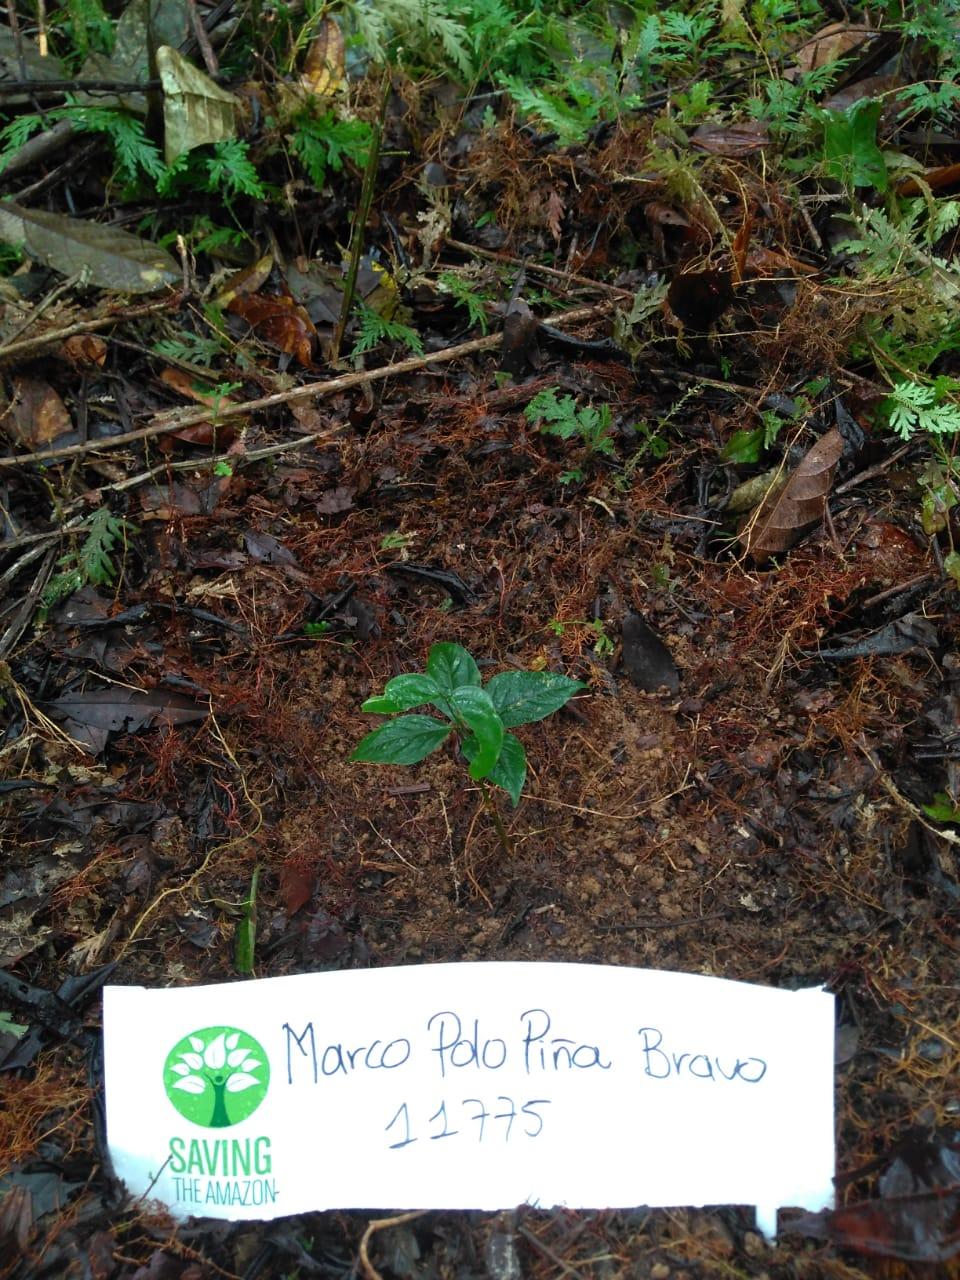 Marco Polo abacaxi Bravo